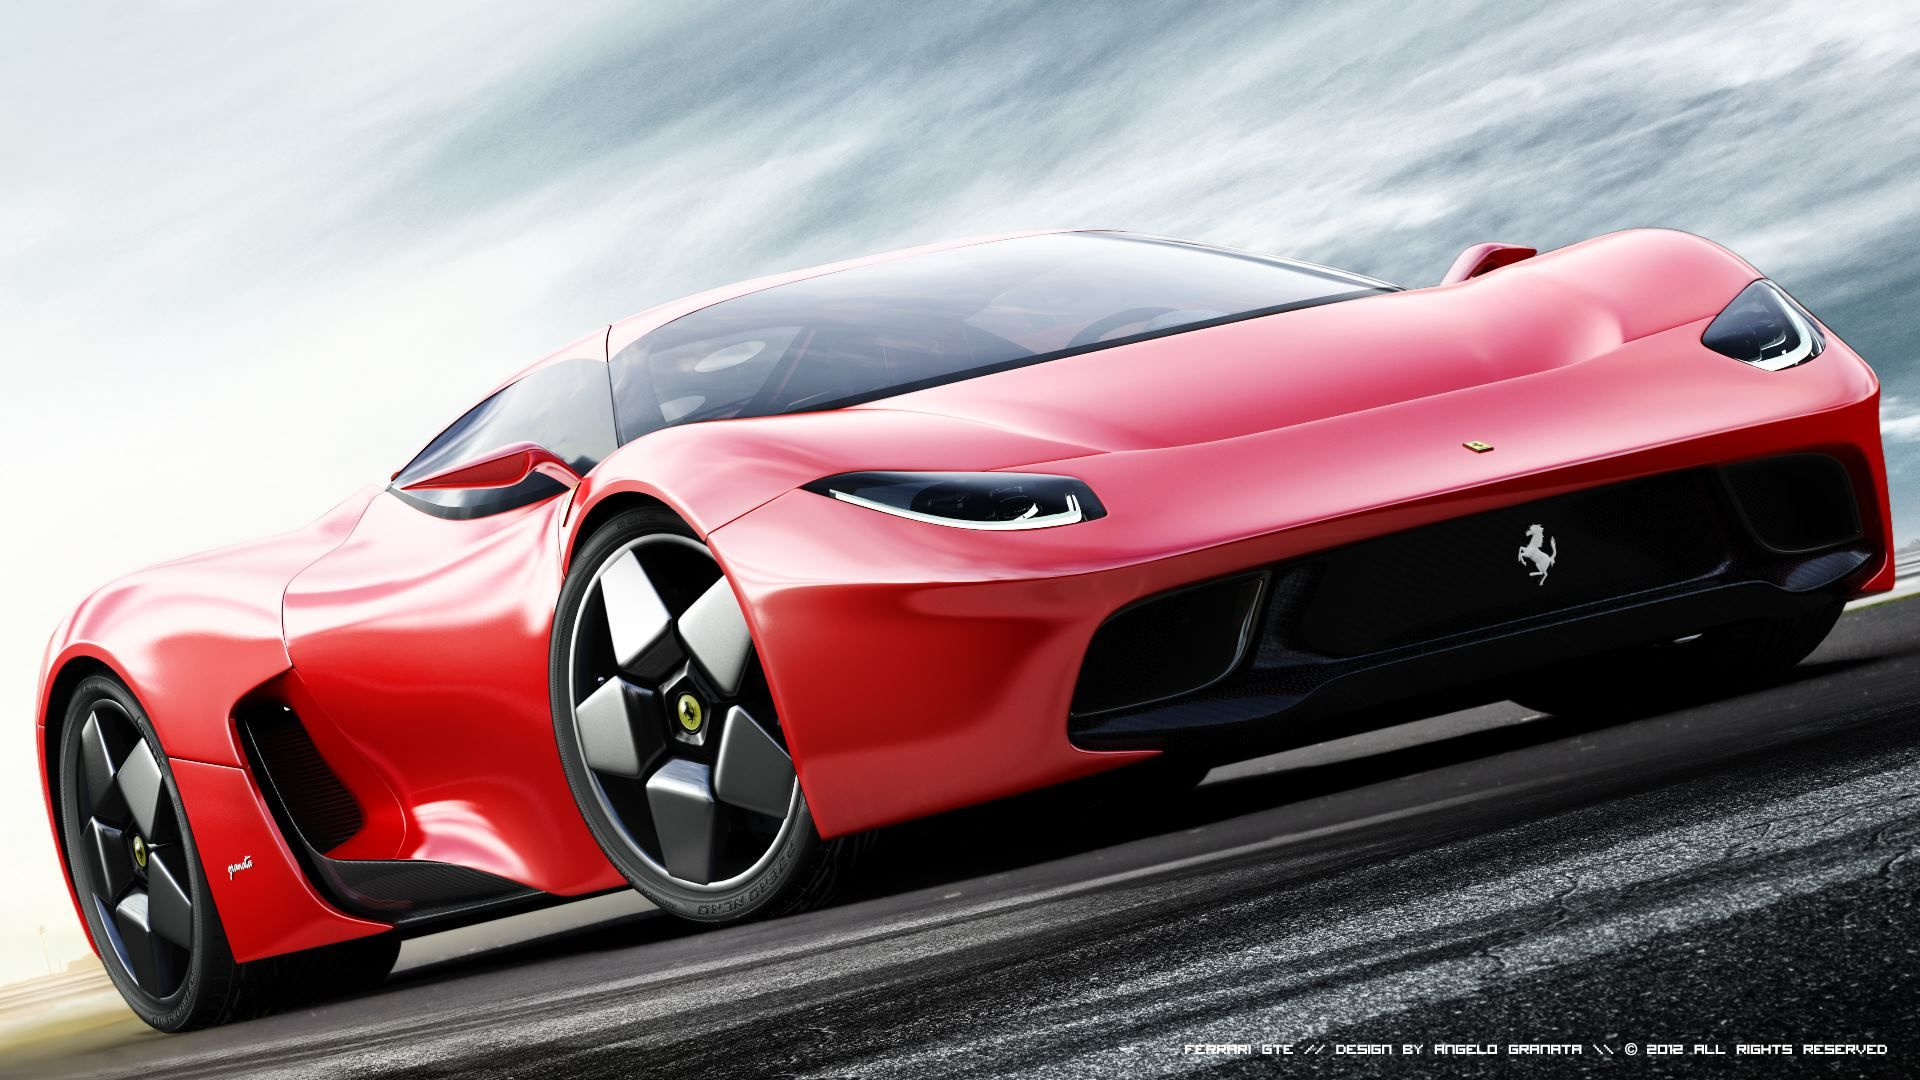 Incroyable Ferrari GTE 2015 Hd Wallpaper